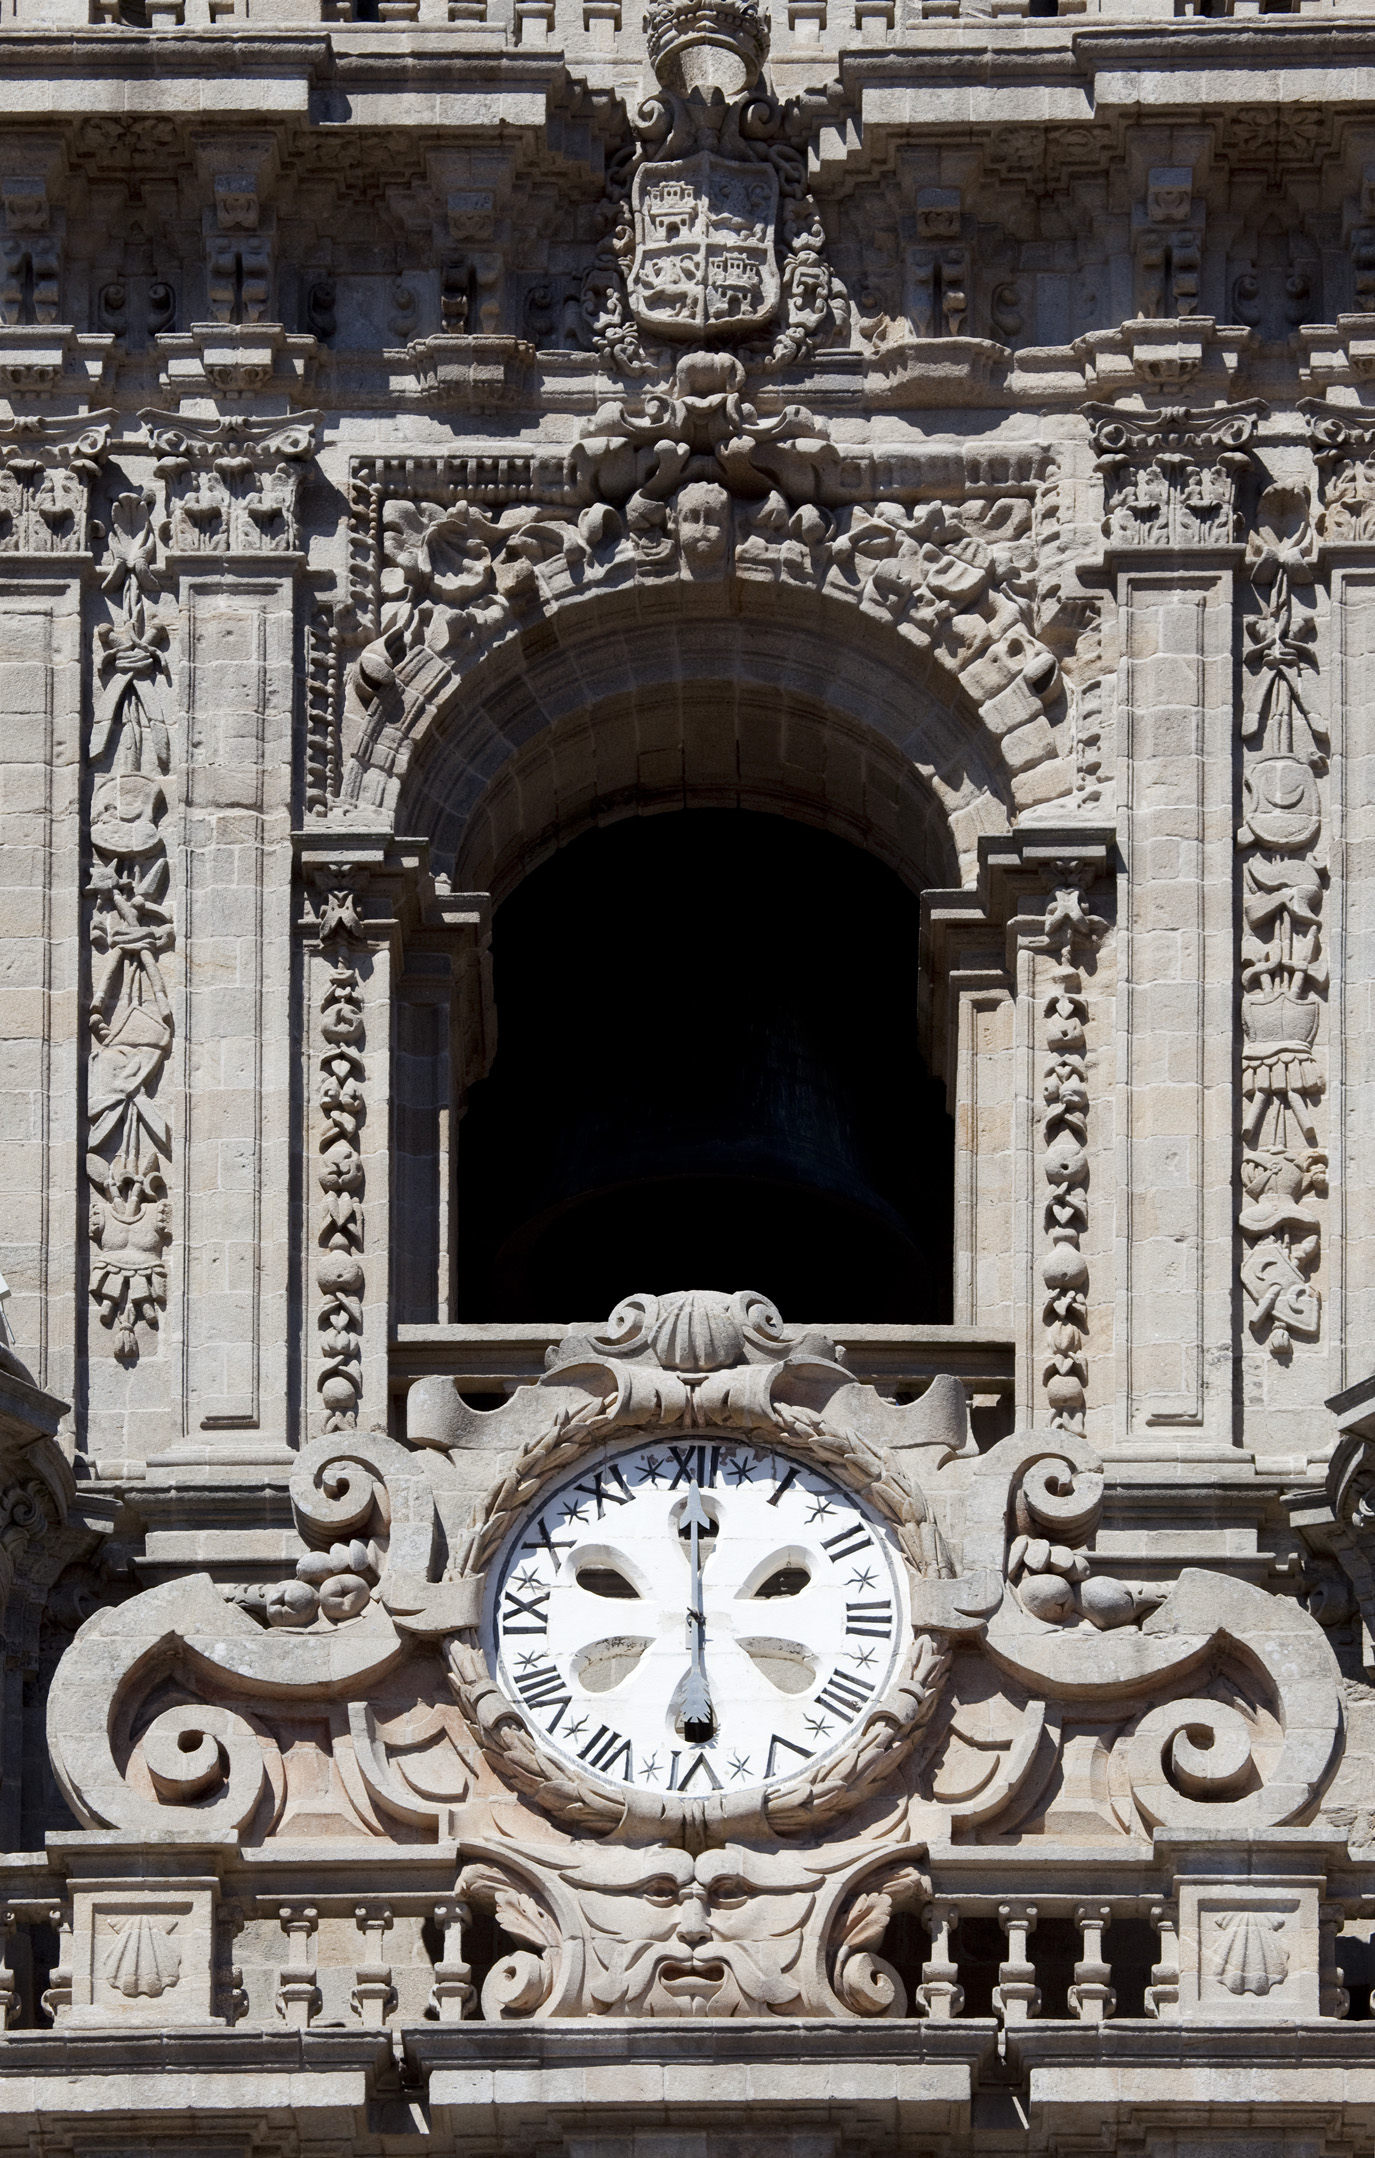 Detalle da torre do reloxo. Fotos: Tino Viz (Margen fotograf�a)